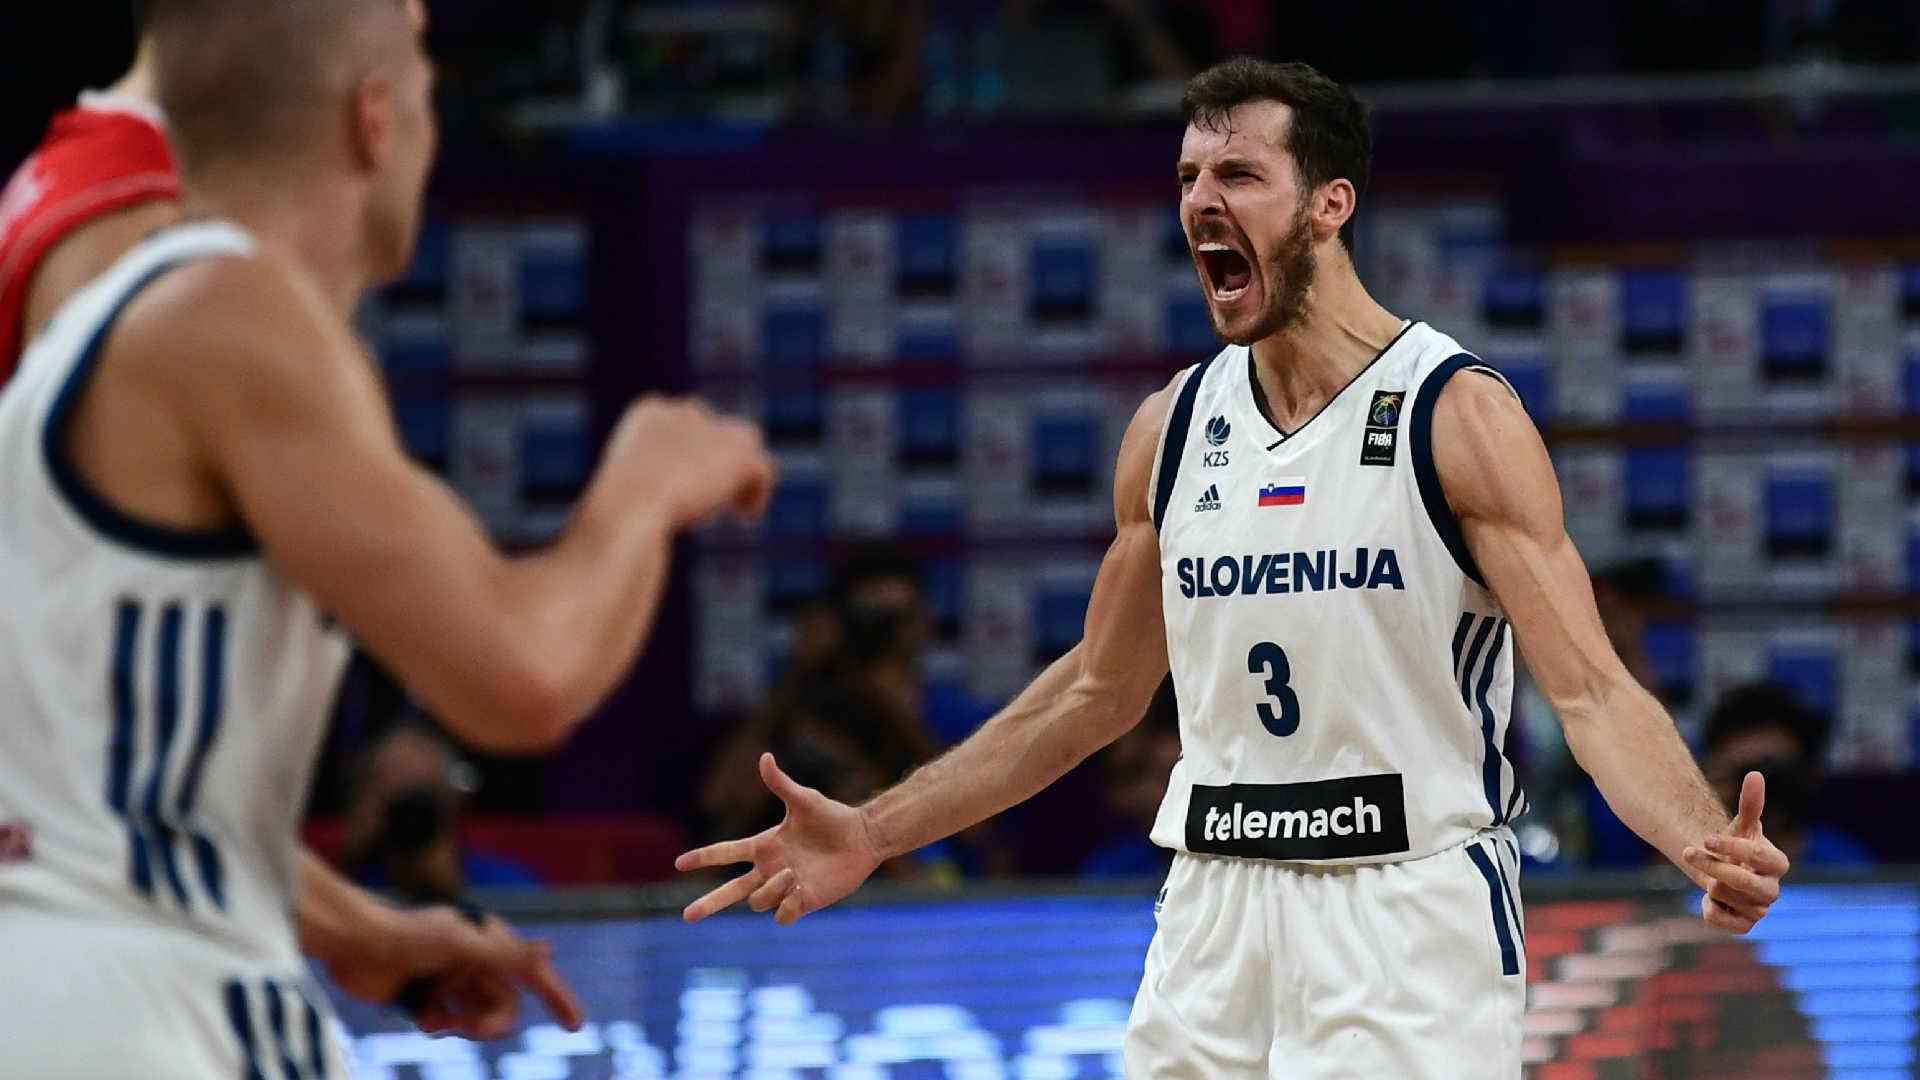 Heat s Goran Dragic named EuroBasket2017 MVP as Slovenia wins title ... be53b6316